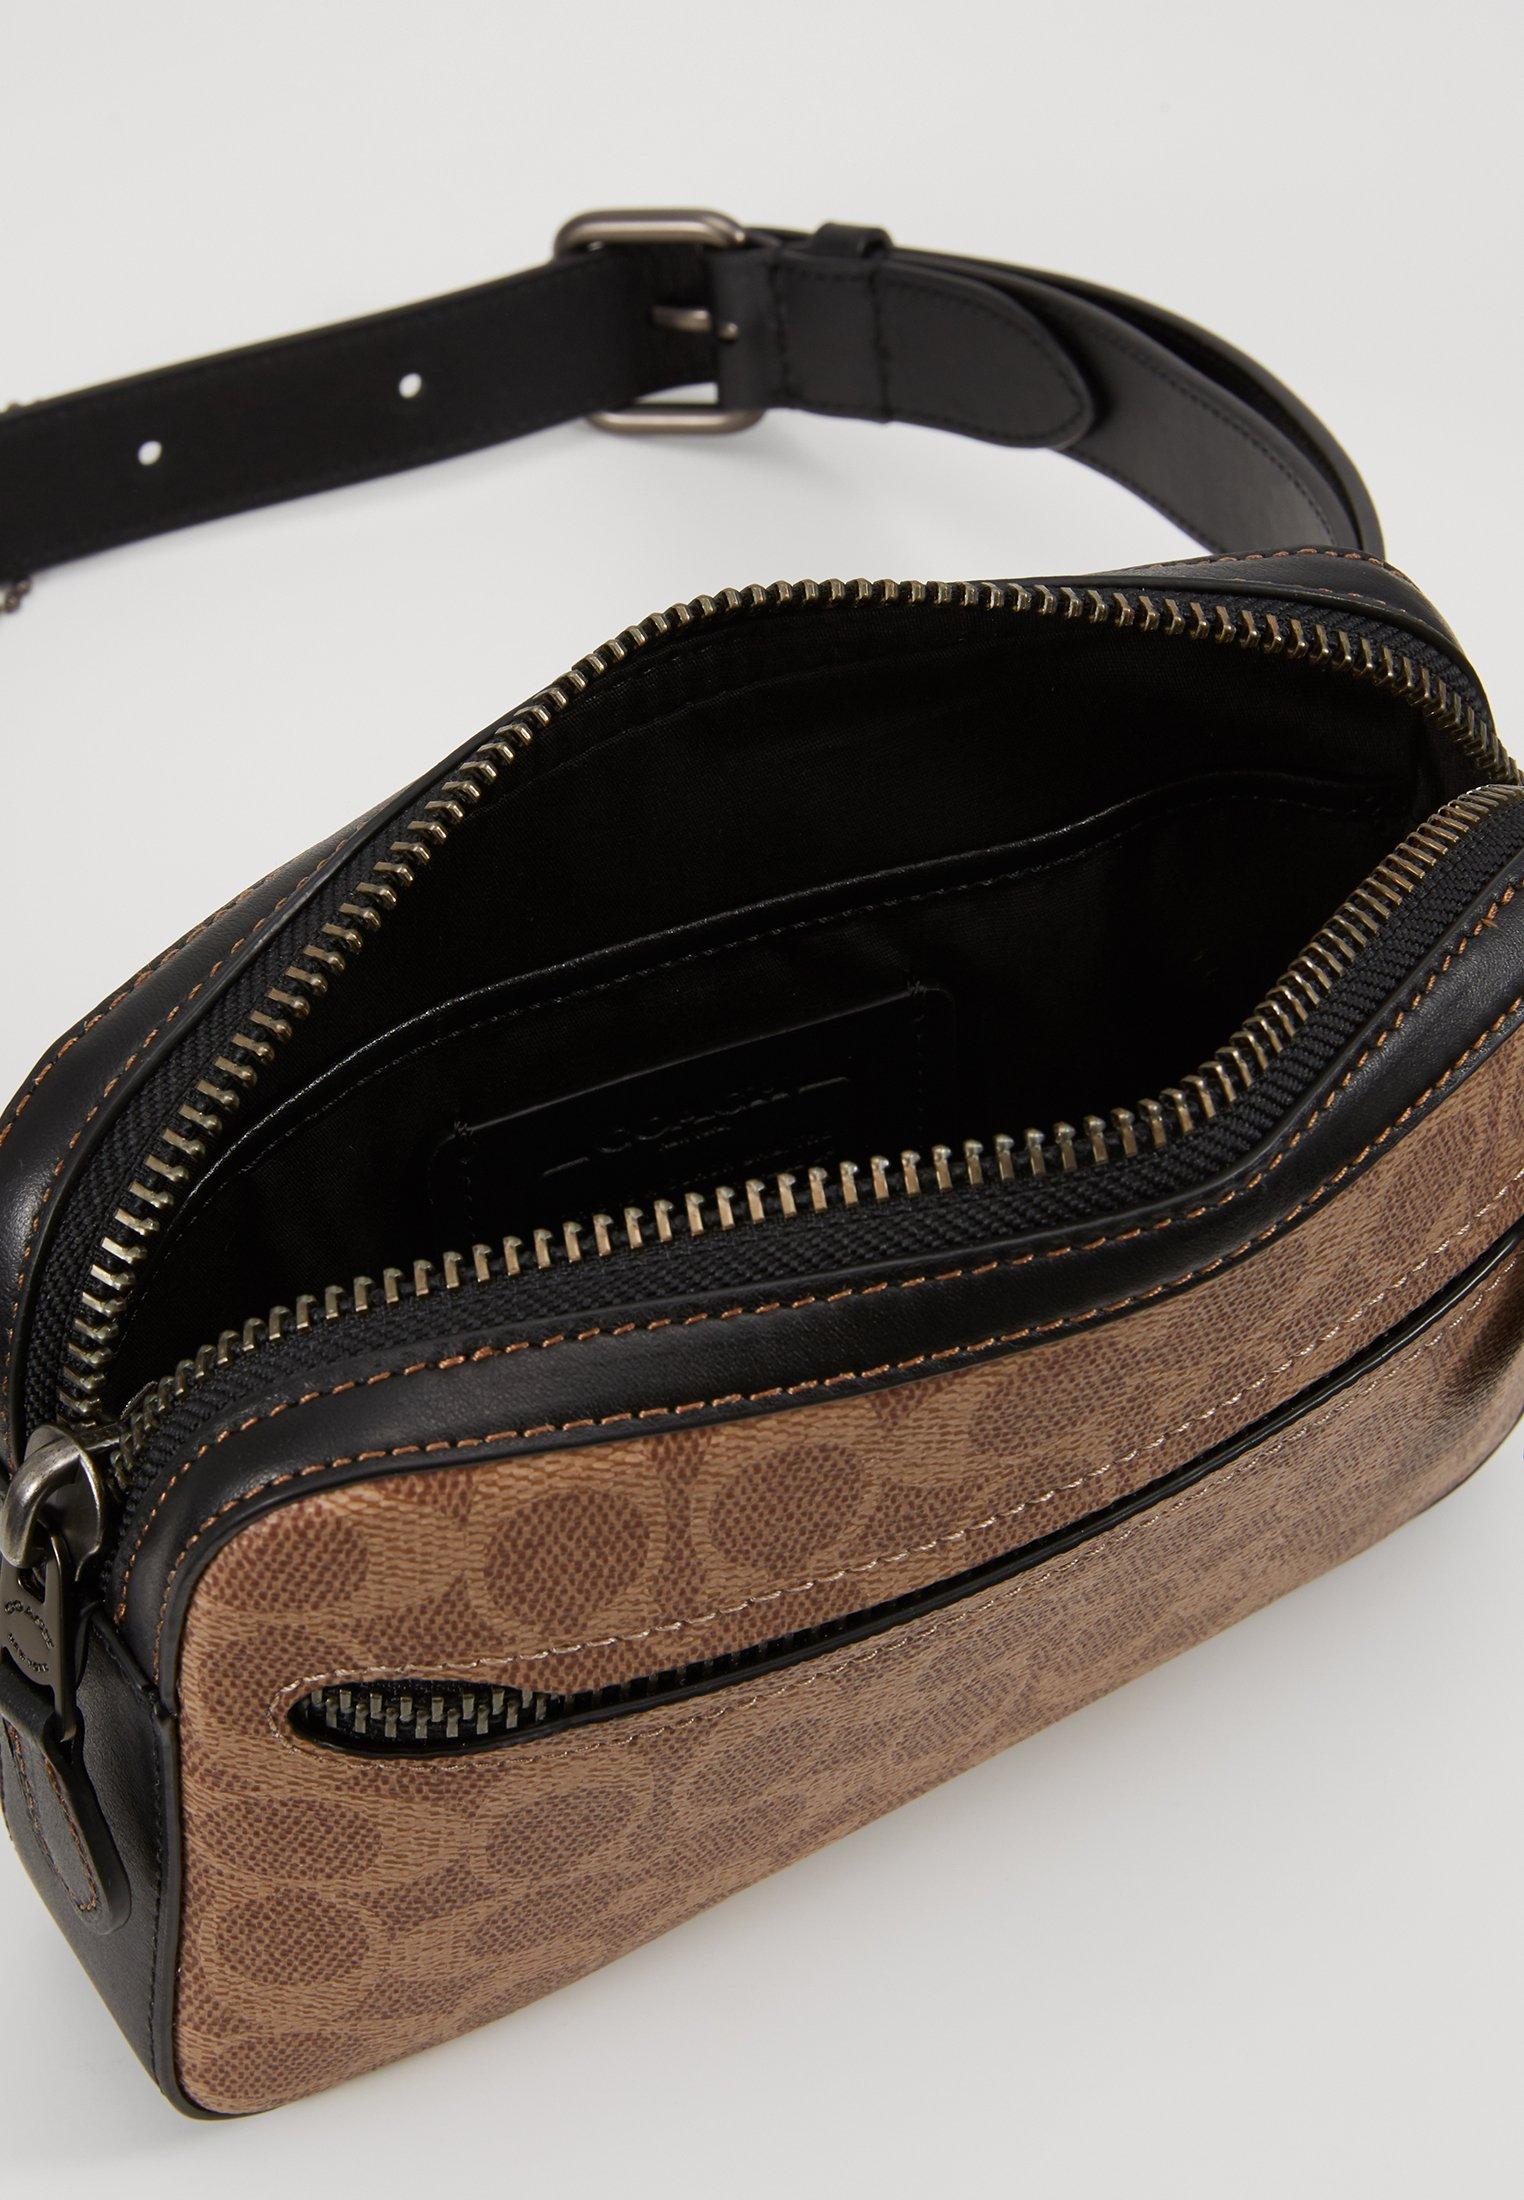 Coach MODERN BUSINESS BELT BAG IN SIGNATURE ANIMATION - Gürteltasche - khaki - Black Friday